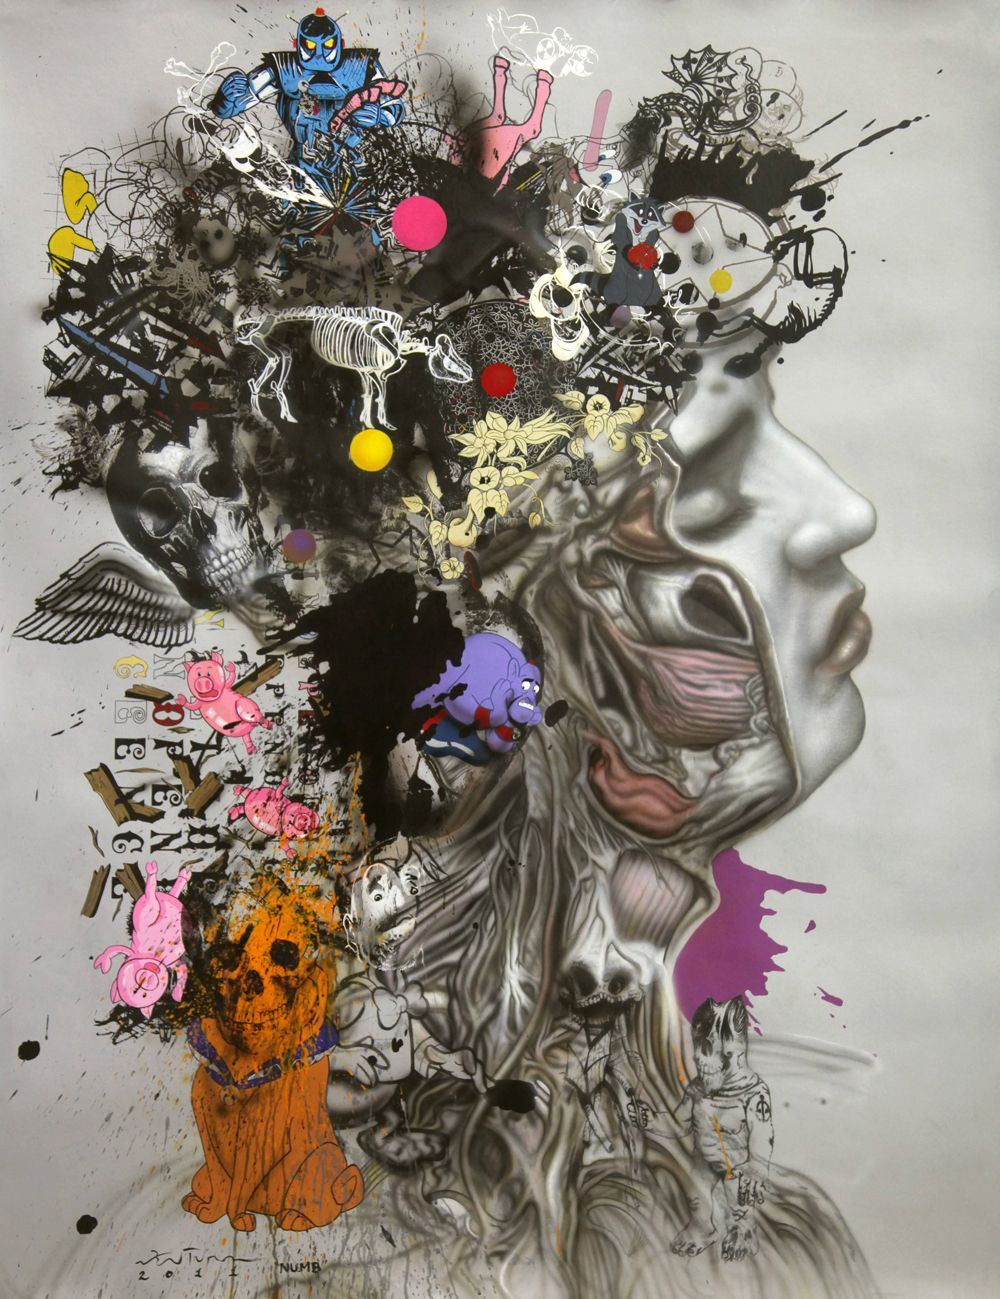 likeafieldmouse Ronald Ventura Numb (2011) Oil on